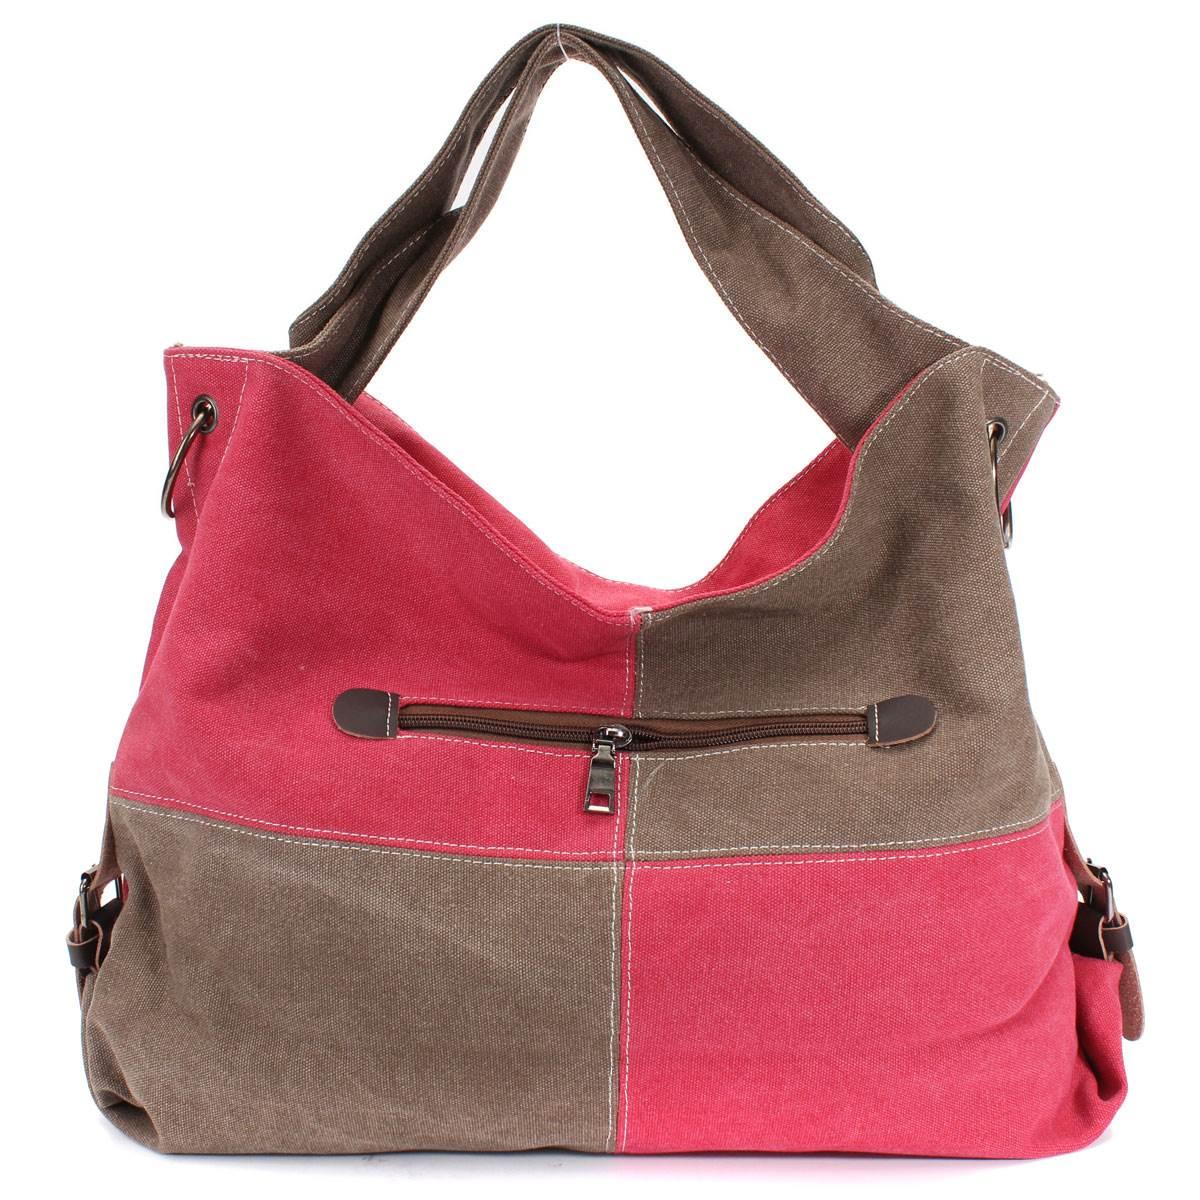 Hot Women Handbags Canvas Hobo Crossbody Bag Patchwork Plaid Brand Designer Top Quality Large Space Ladies Shoulder Bags(China (Mainland))